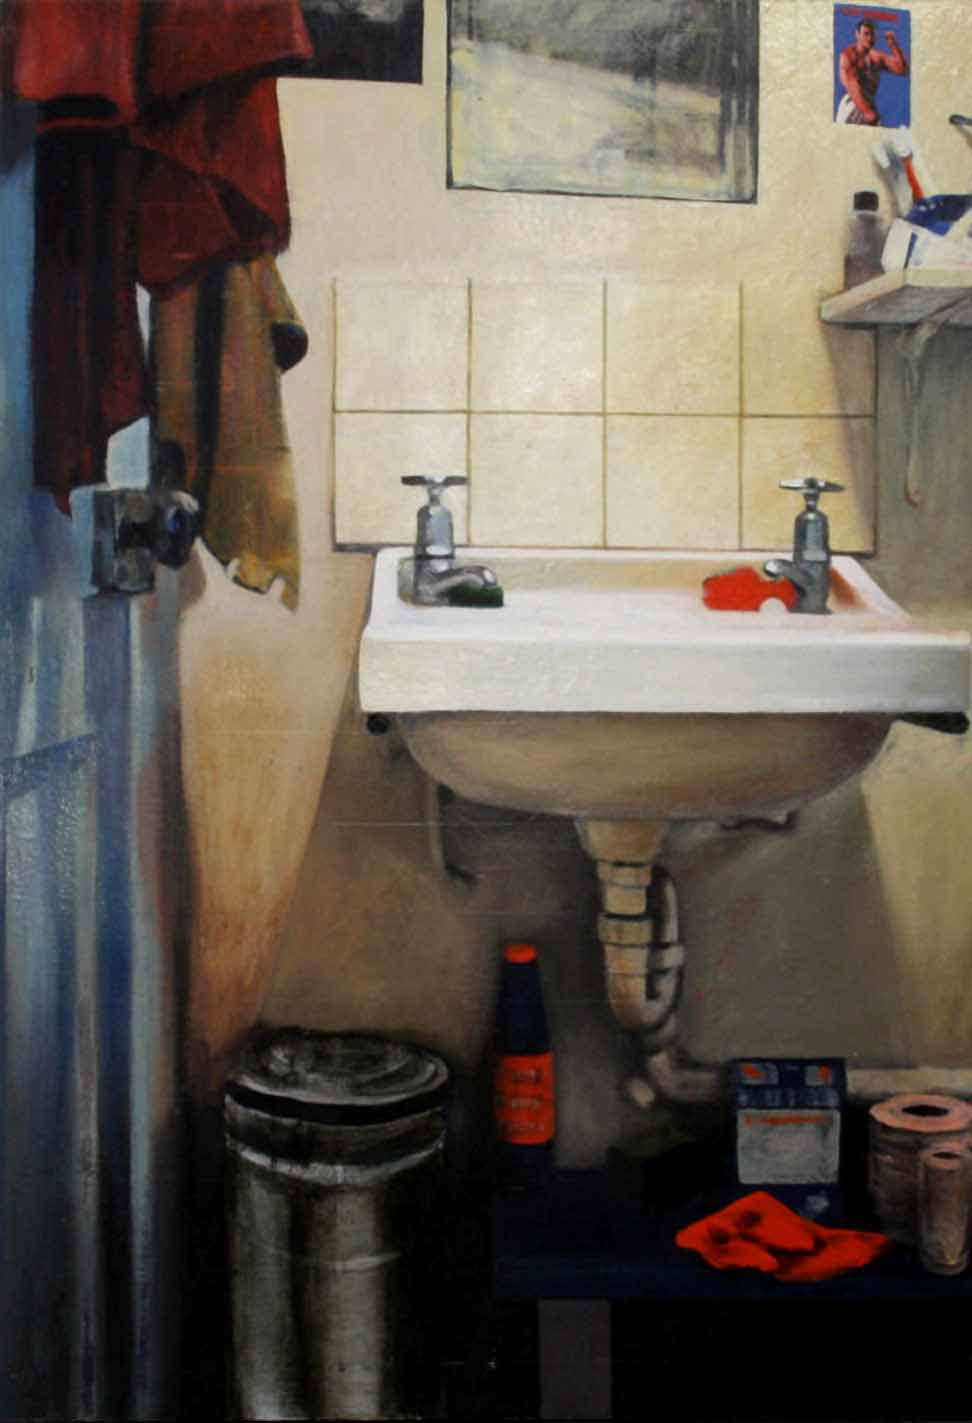 Basin With Towel no2, 1995, enamel on board, 1,2x0,85m